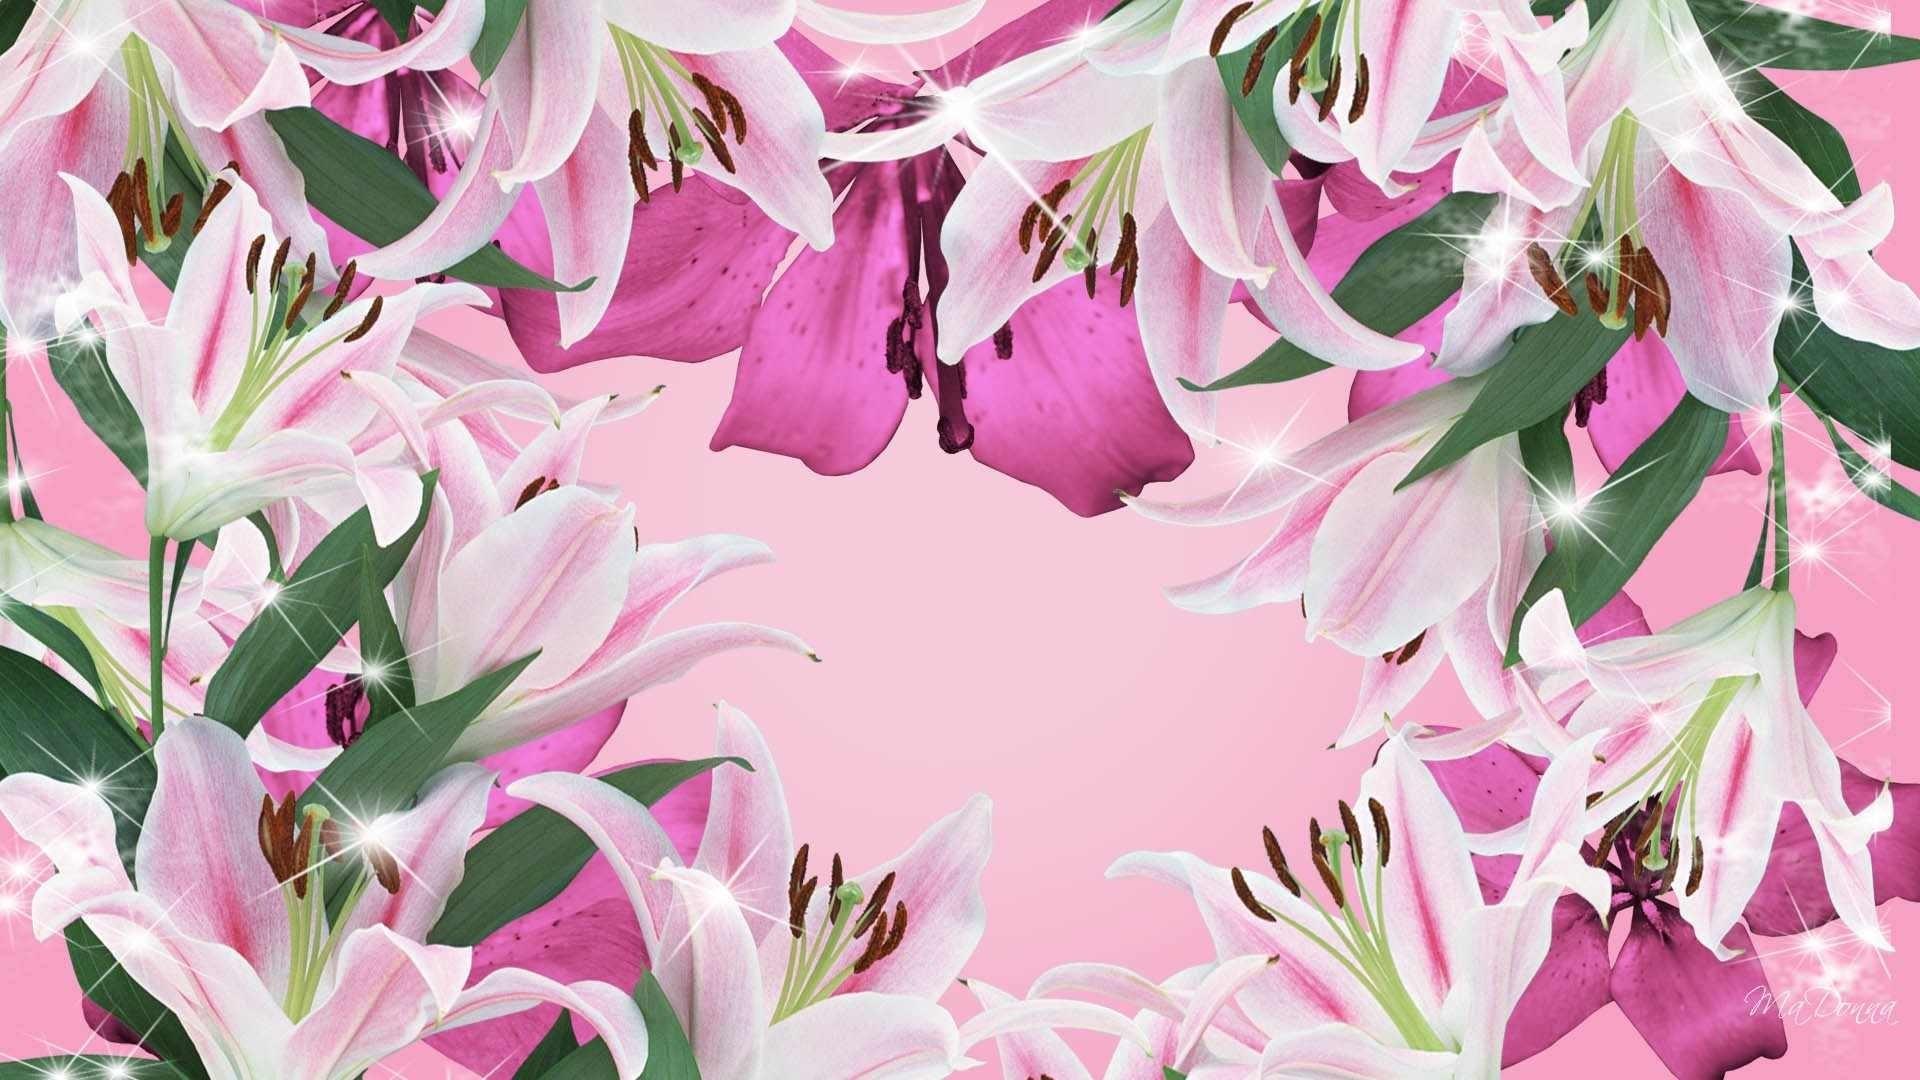 Pretty Flower Wallpaper 49 Images